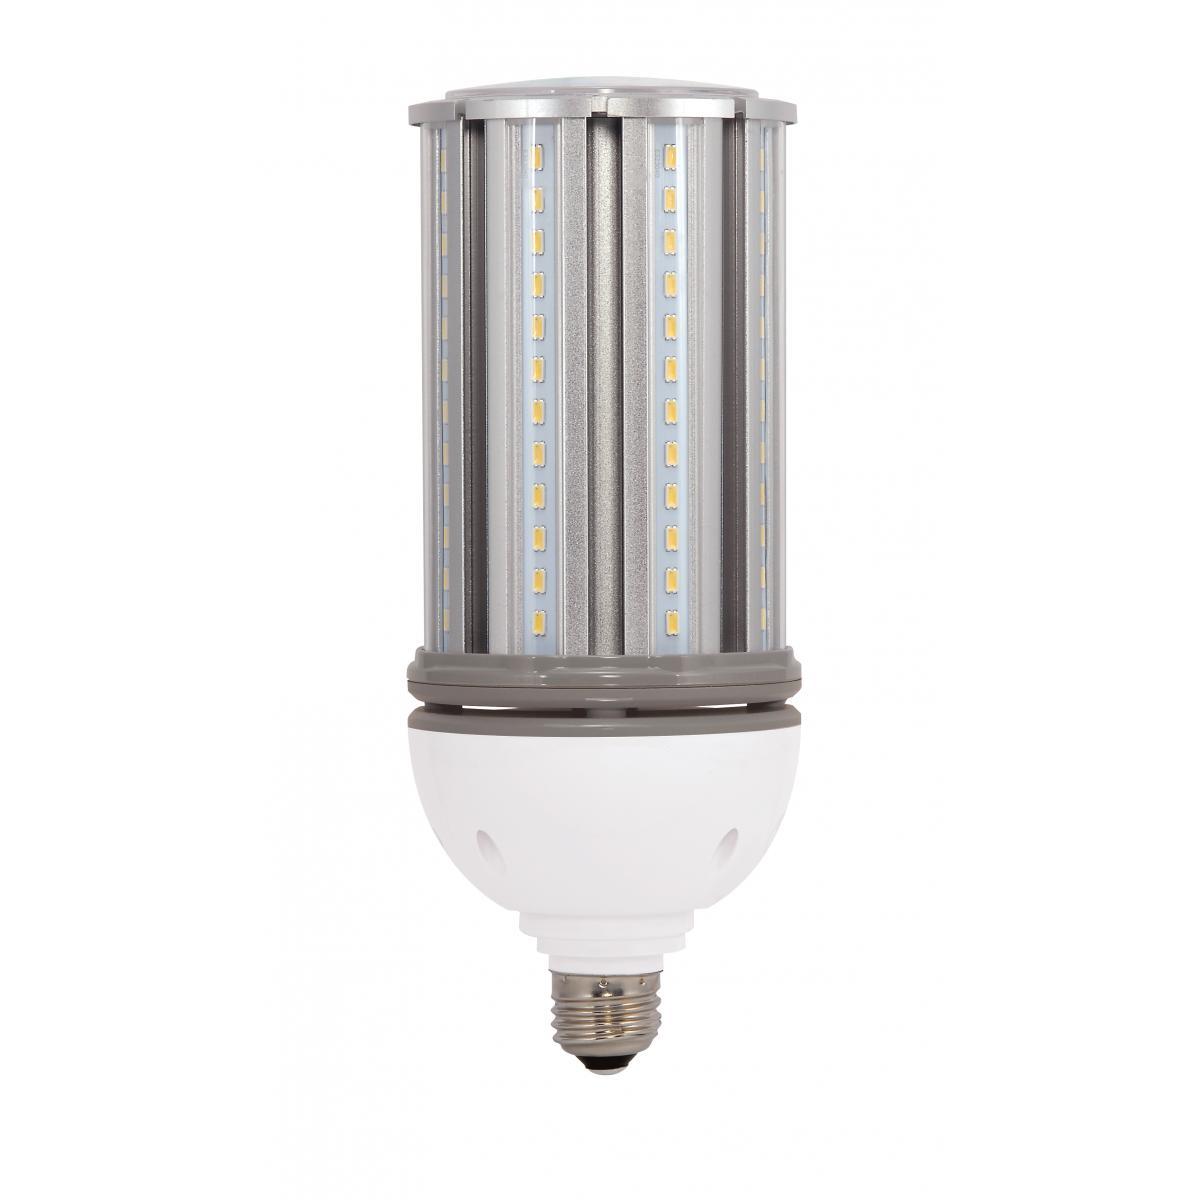 S9489 36W/LED/HID/AMBER/100-277V E26